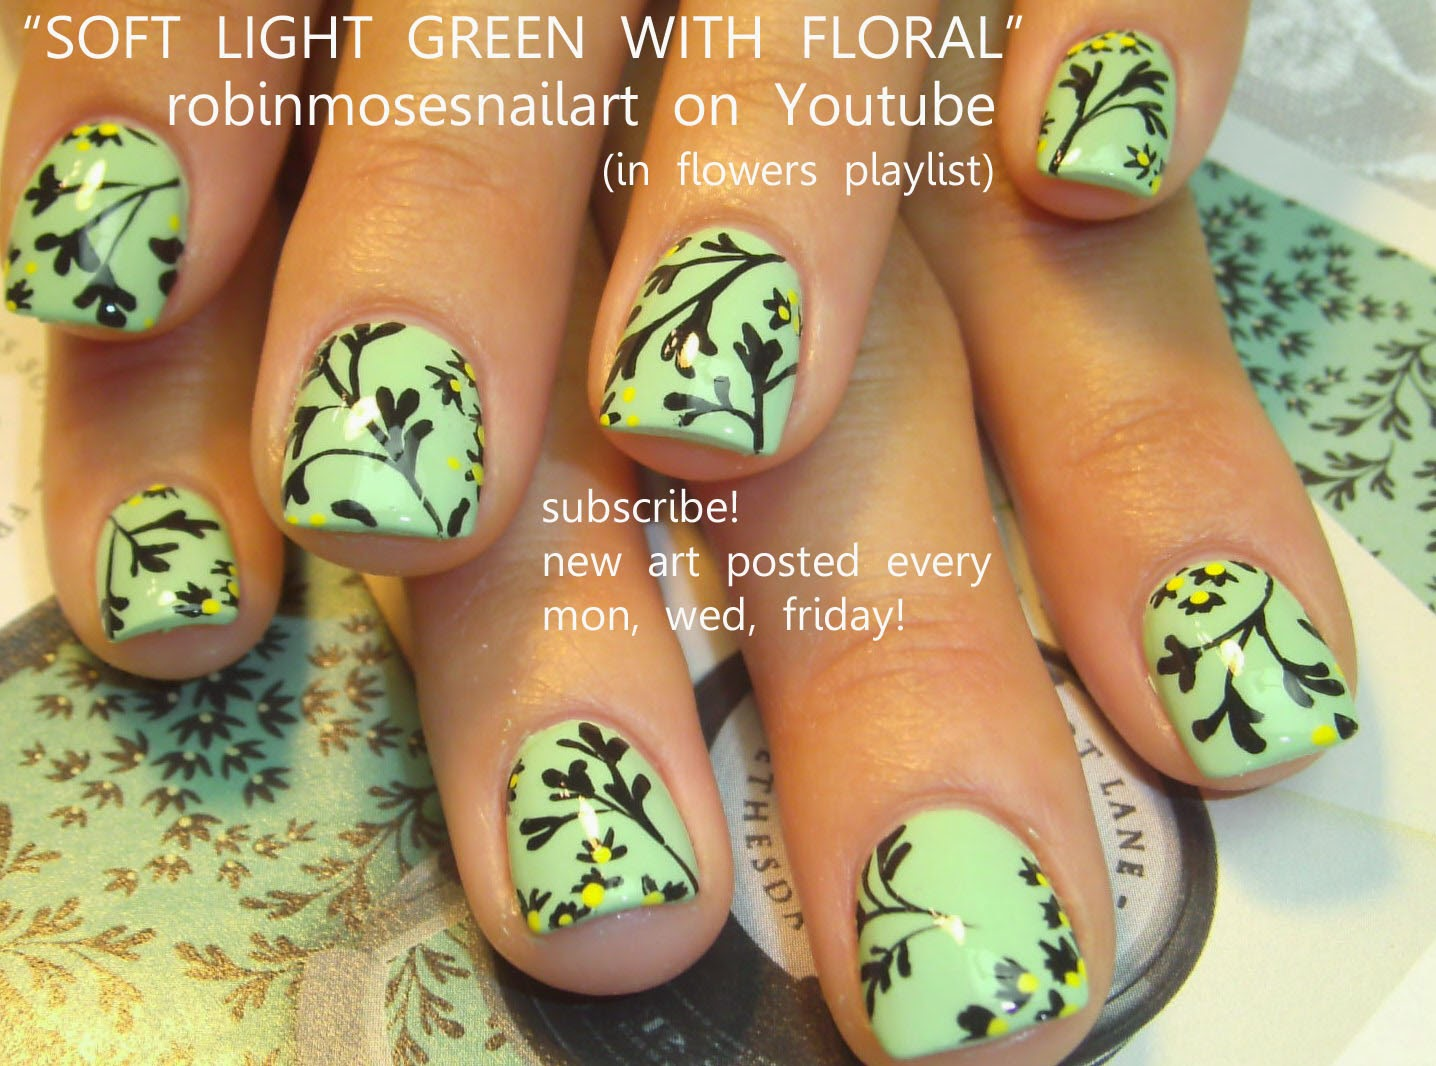 Nail art by robin moses short nail art natural nail art fall nail art tutorials elegant nail art designs easy nail art for beginners and up diy formal party nail art tutorials solutioingenieria Images